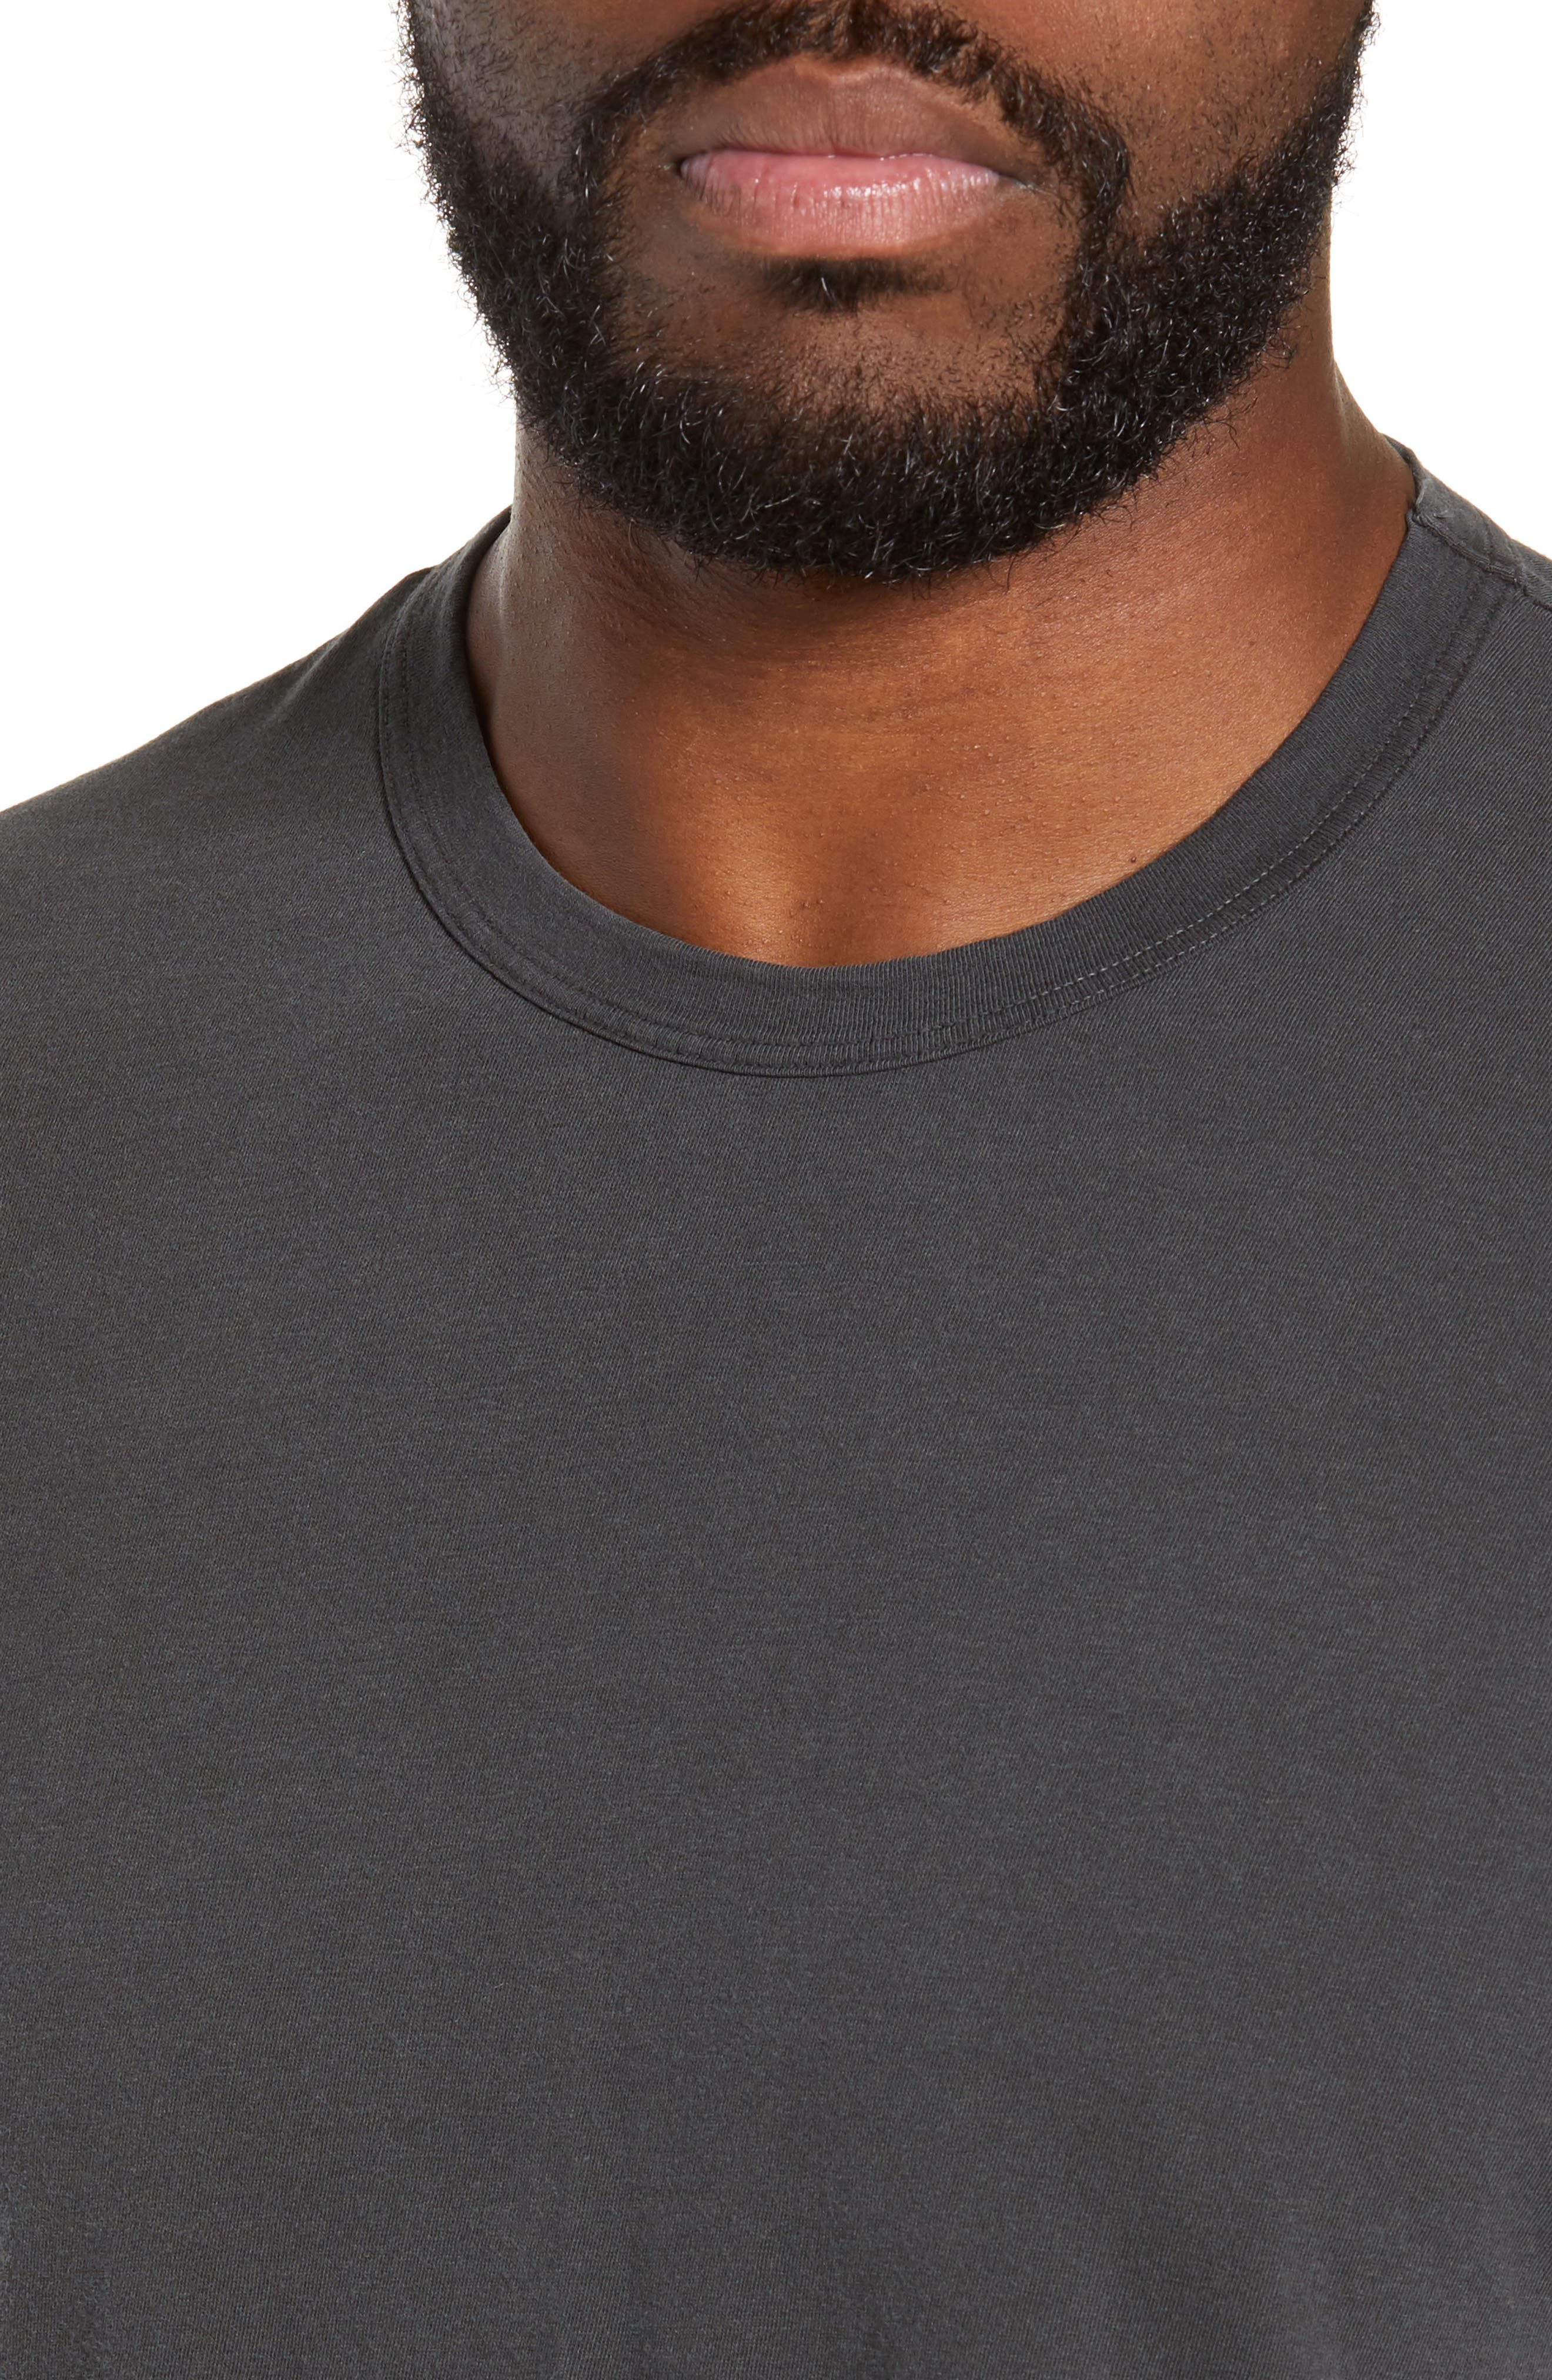 Regular Fit Tonal Palms Crewneck Shirt,                             Alternate thumbnail 4, color,                             CARBON PIGMENT